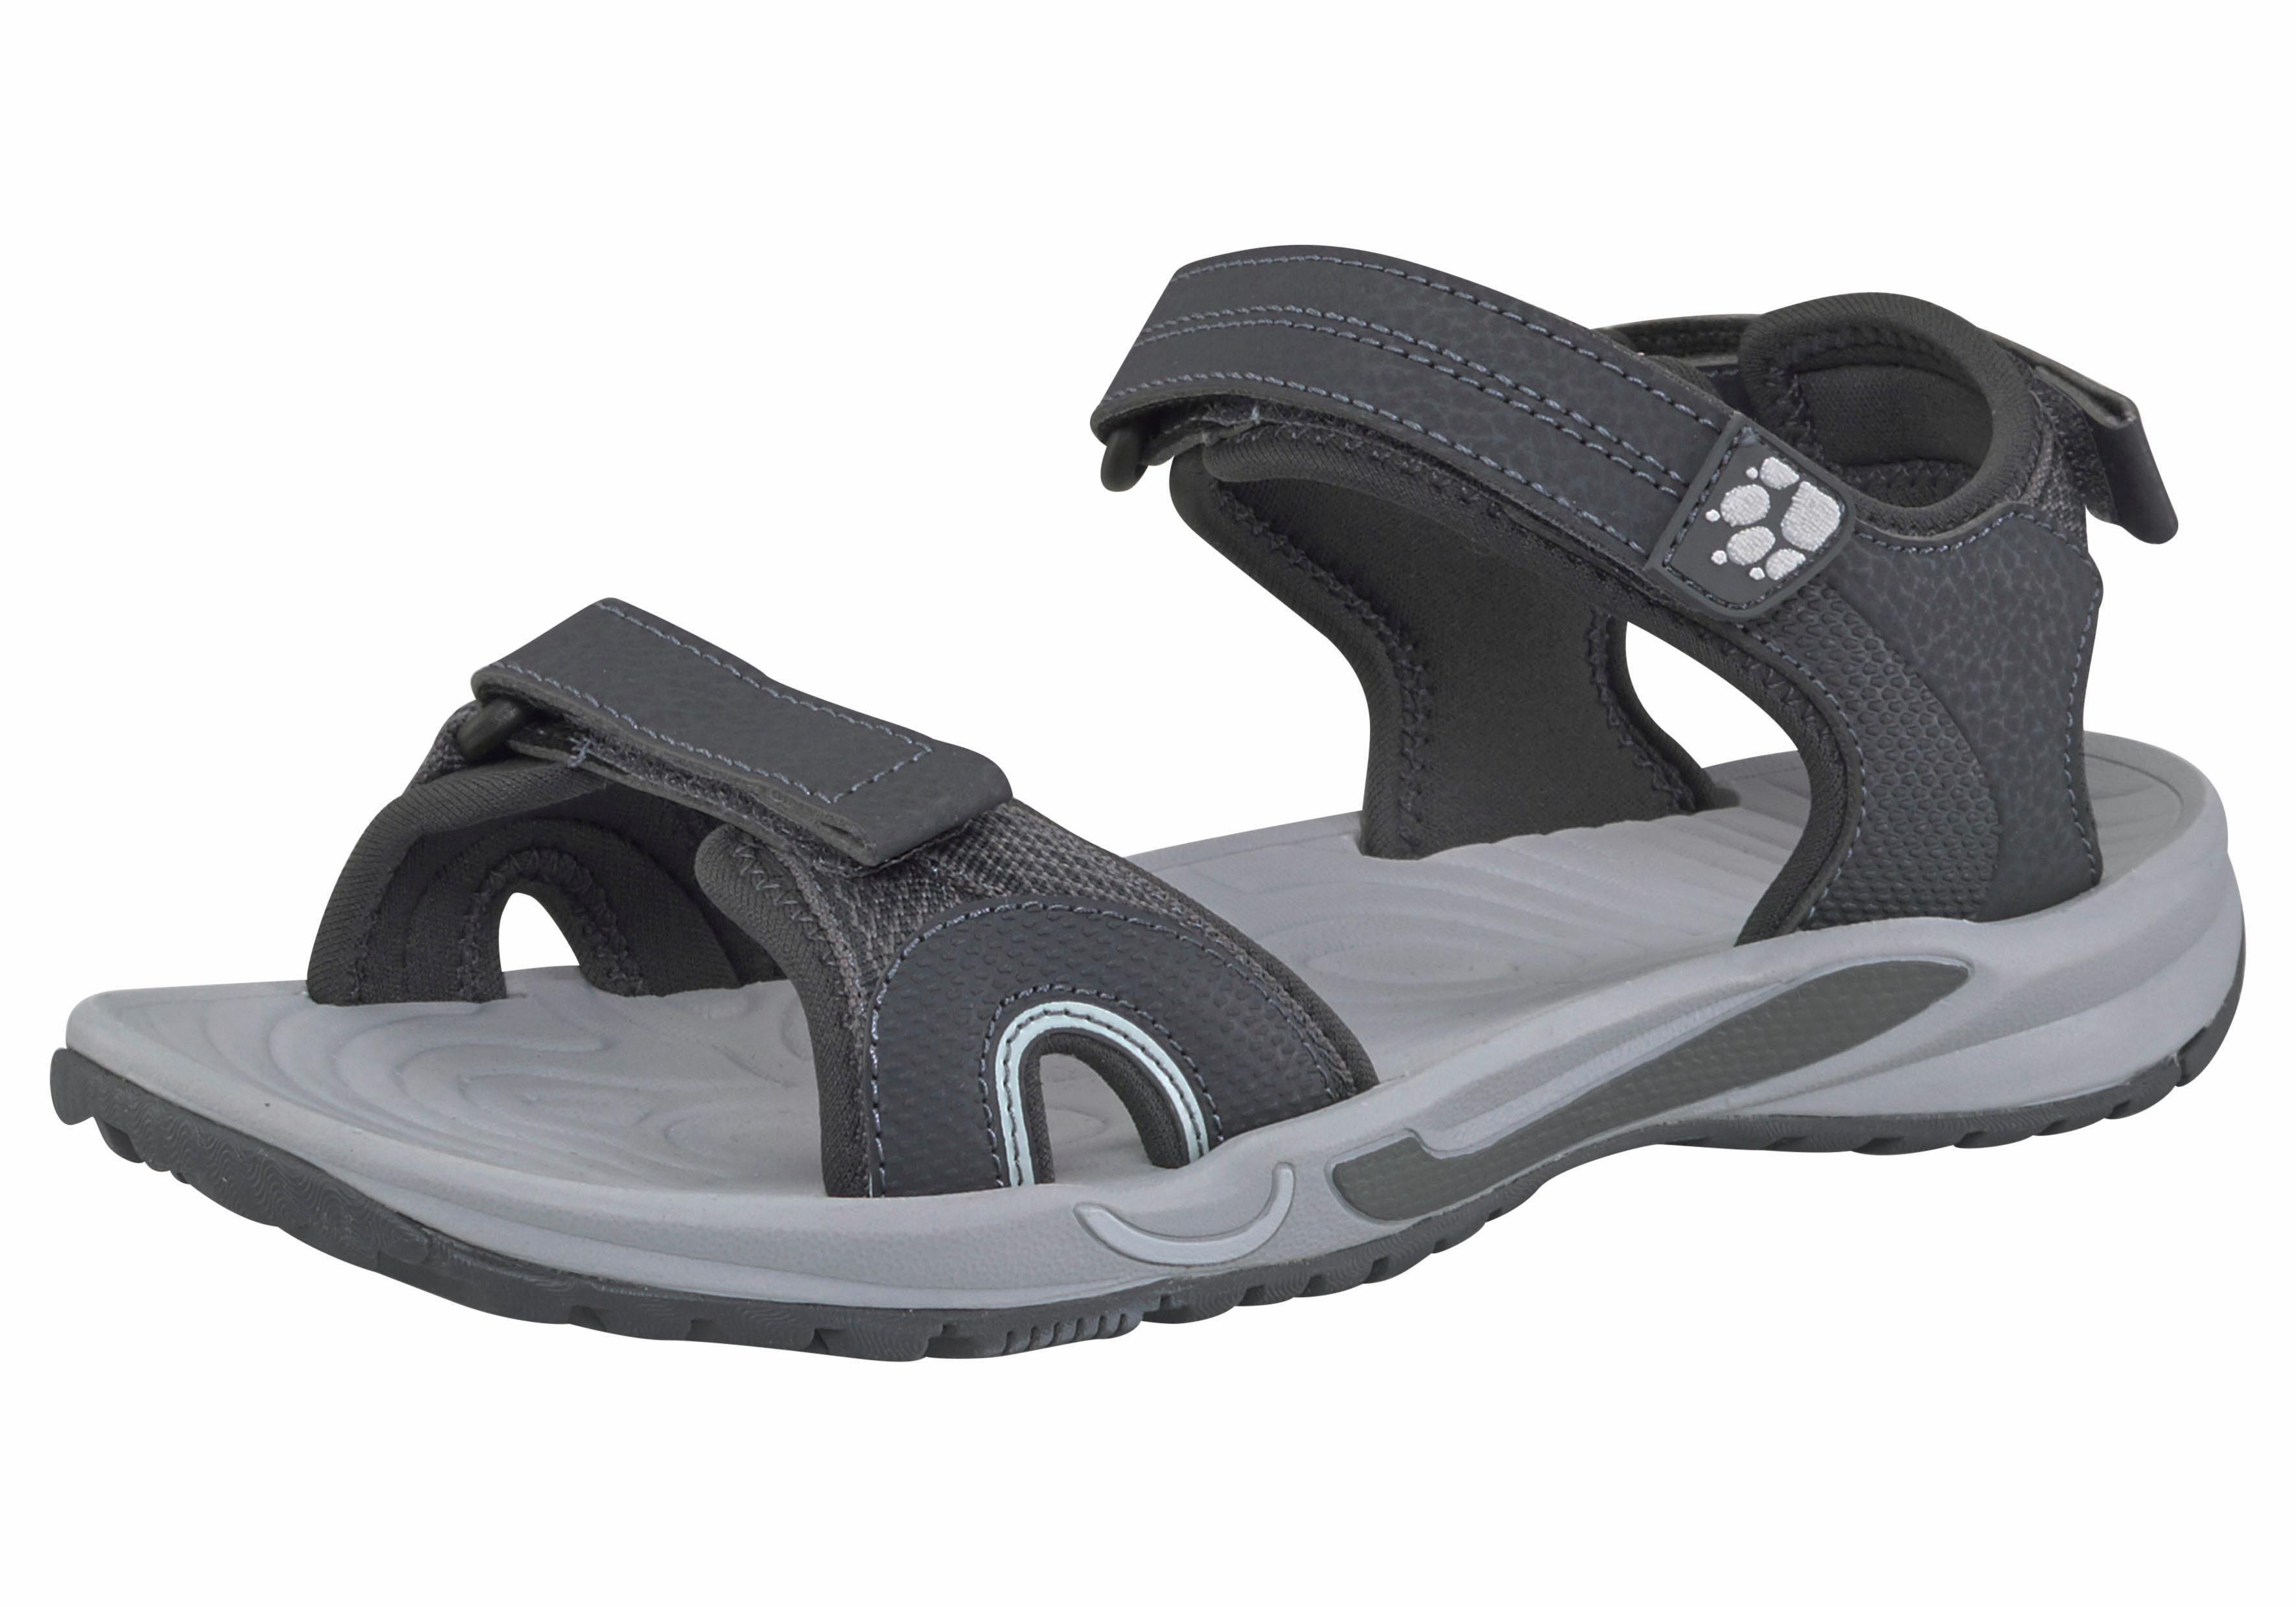 Jack Wolfskin Frauen Sandalen Lakewood Cruise Sandal Women 39,5 schwarz